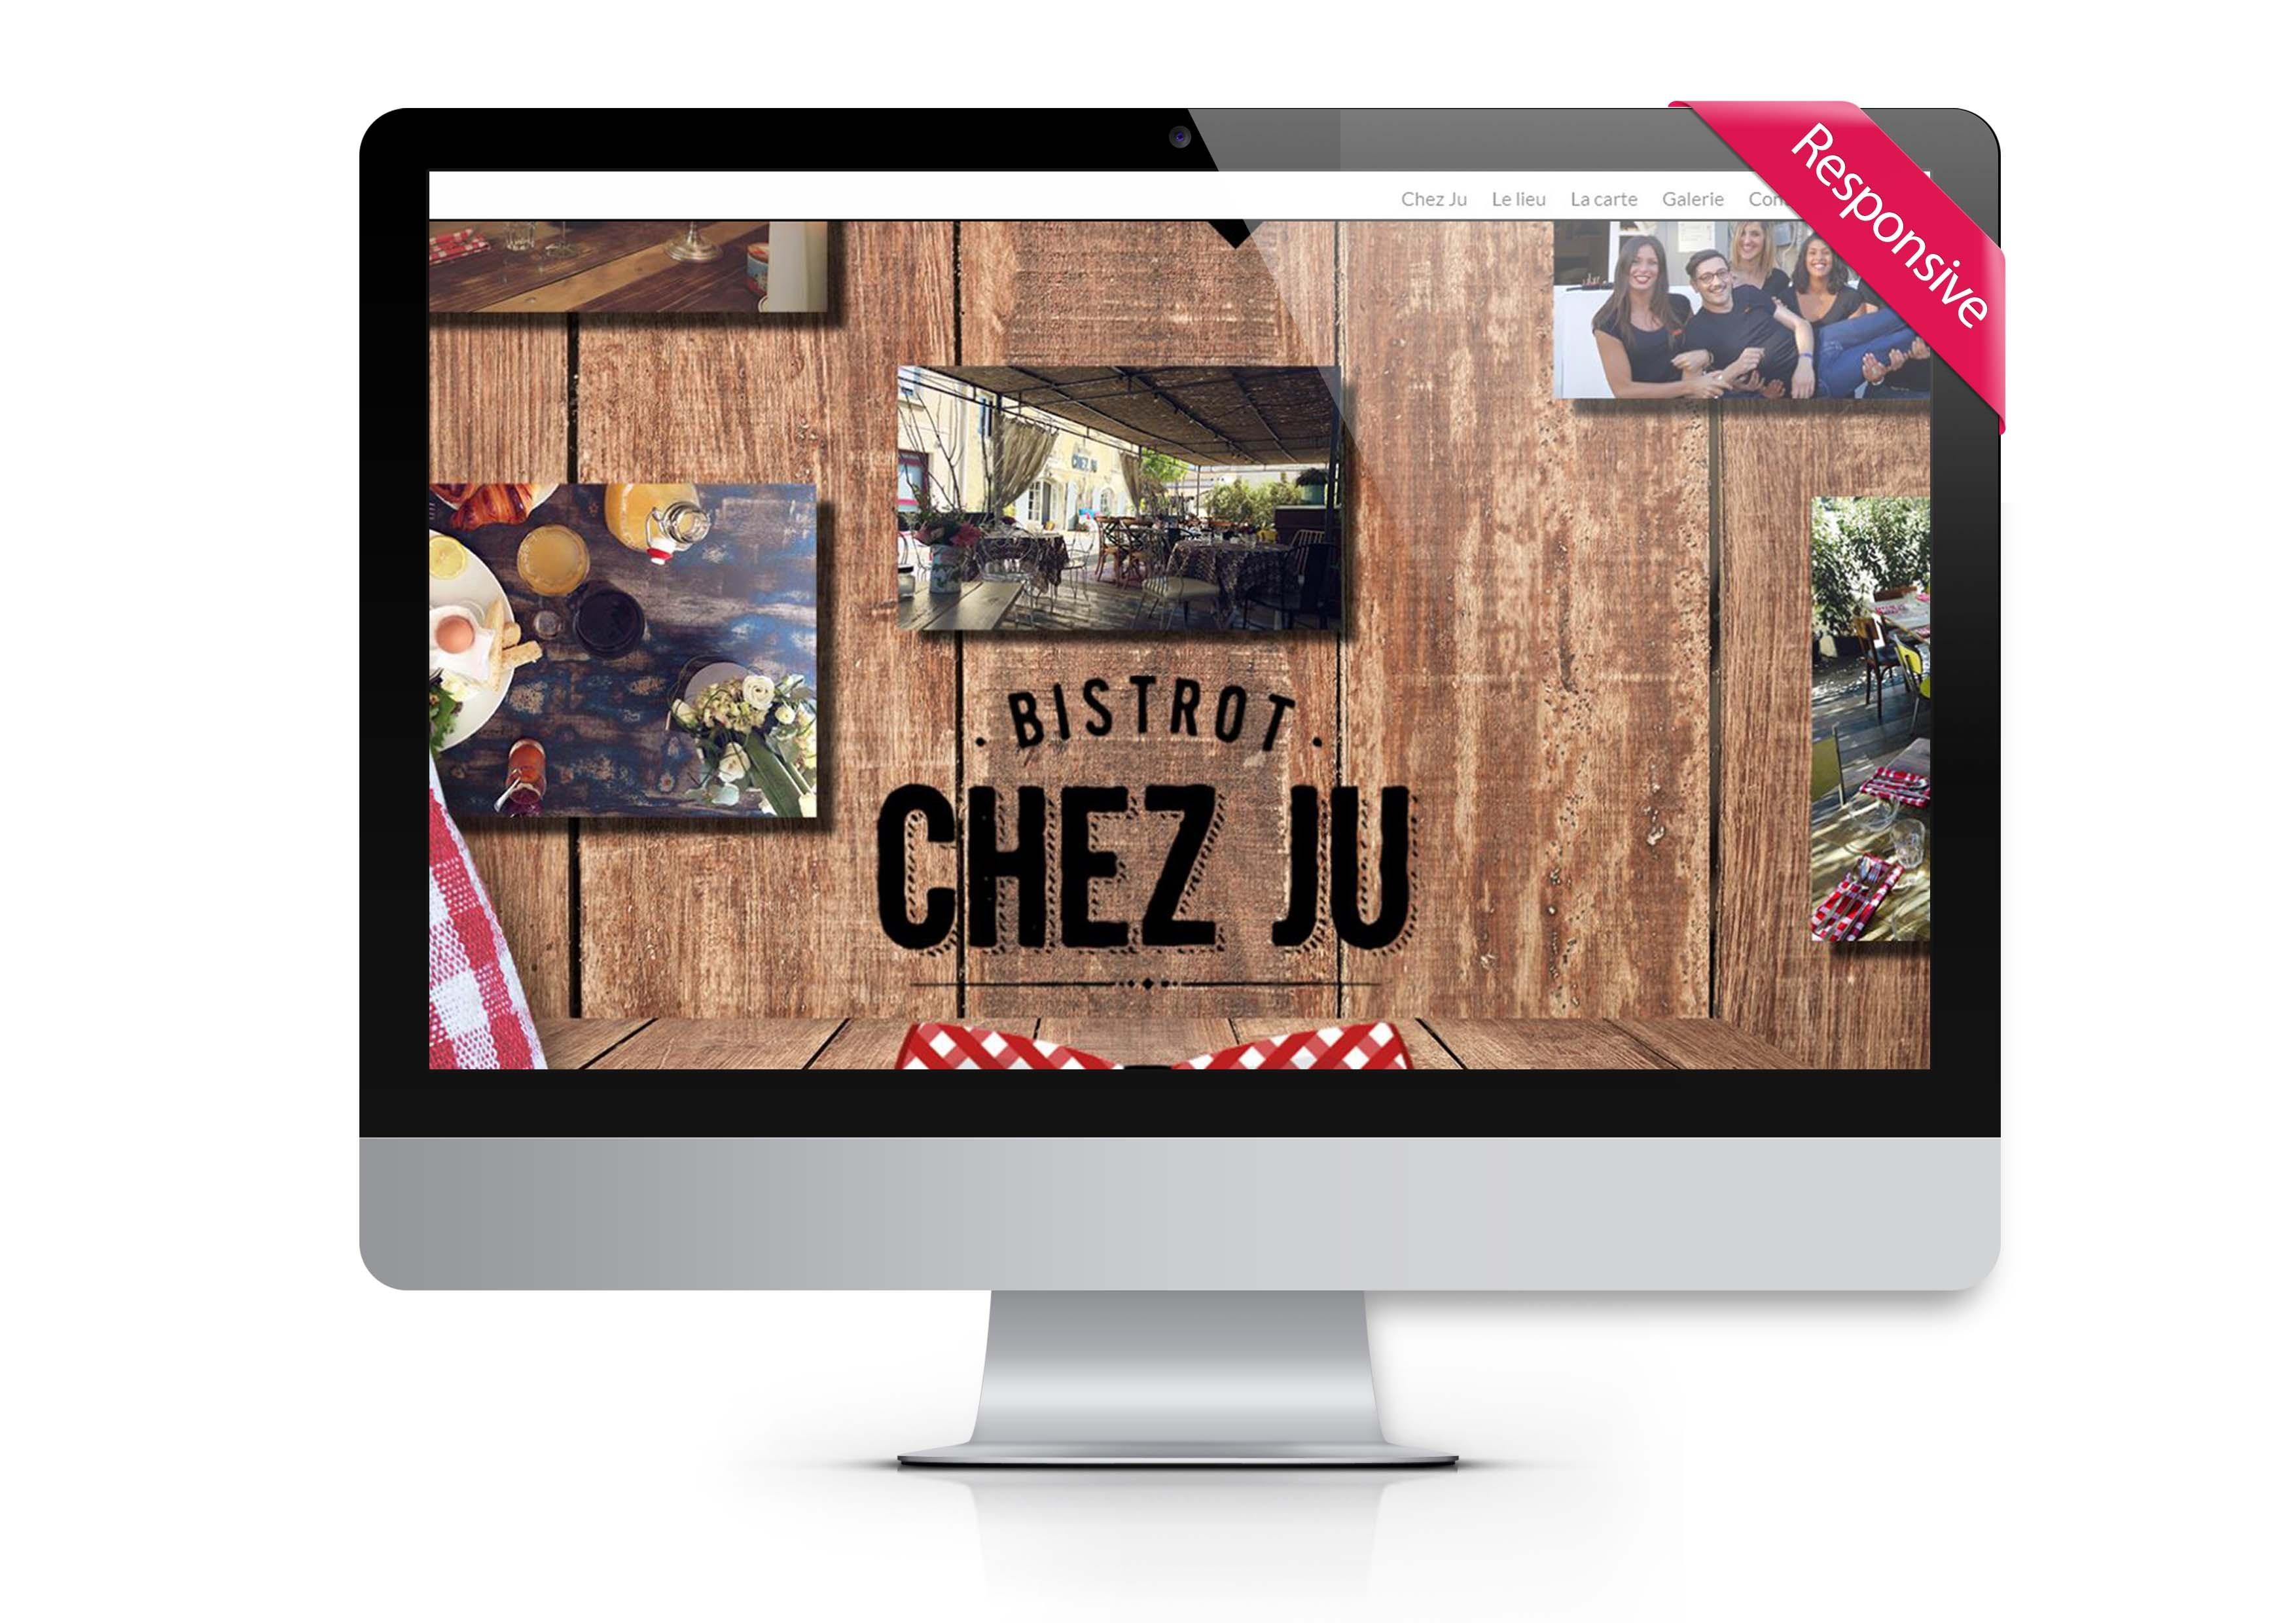 Bistrot Chez Ju